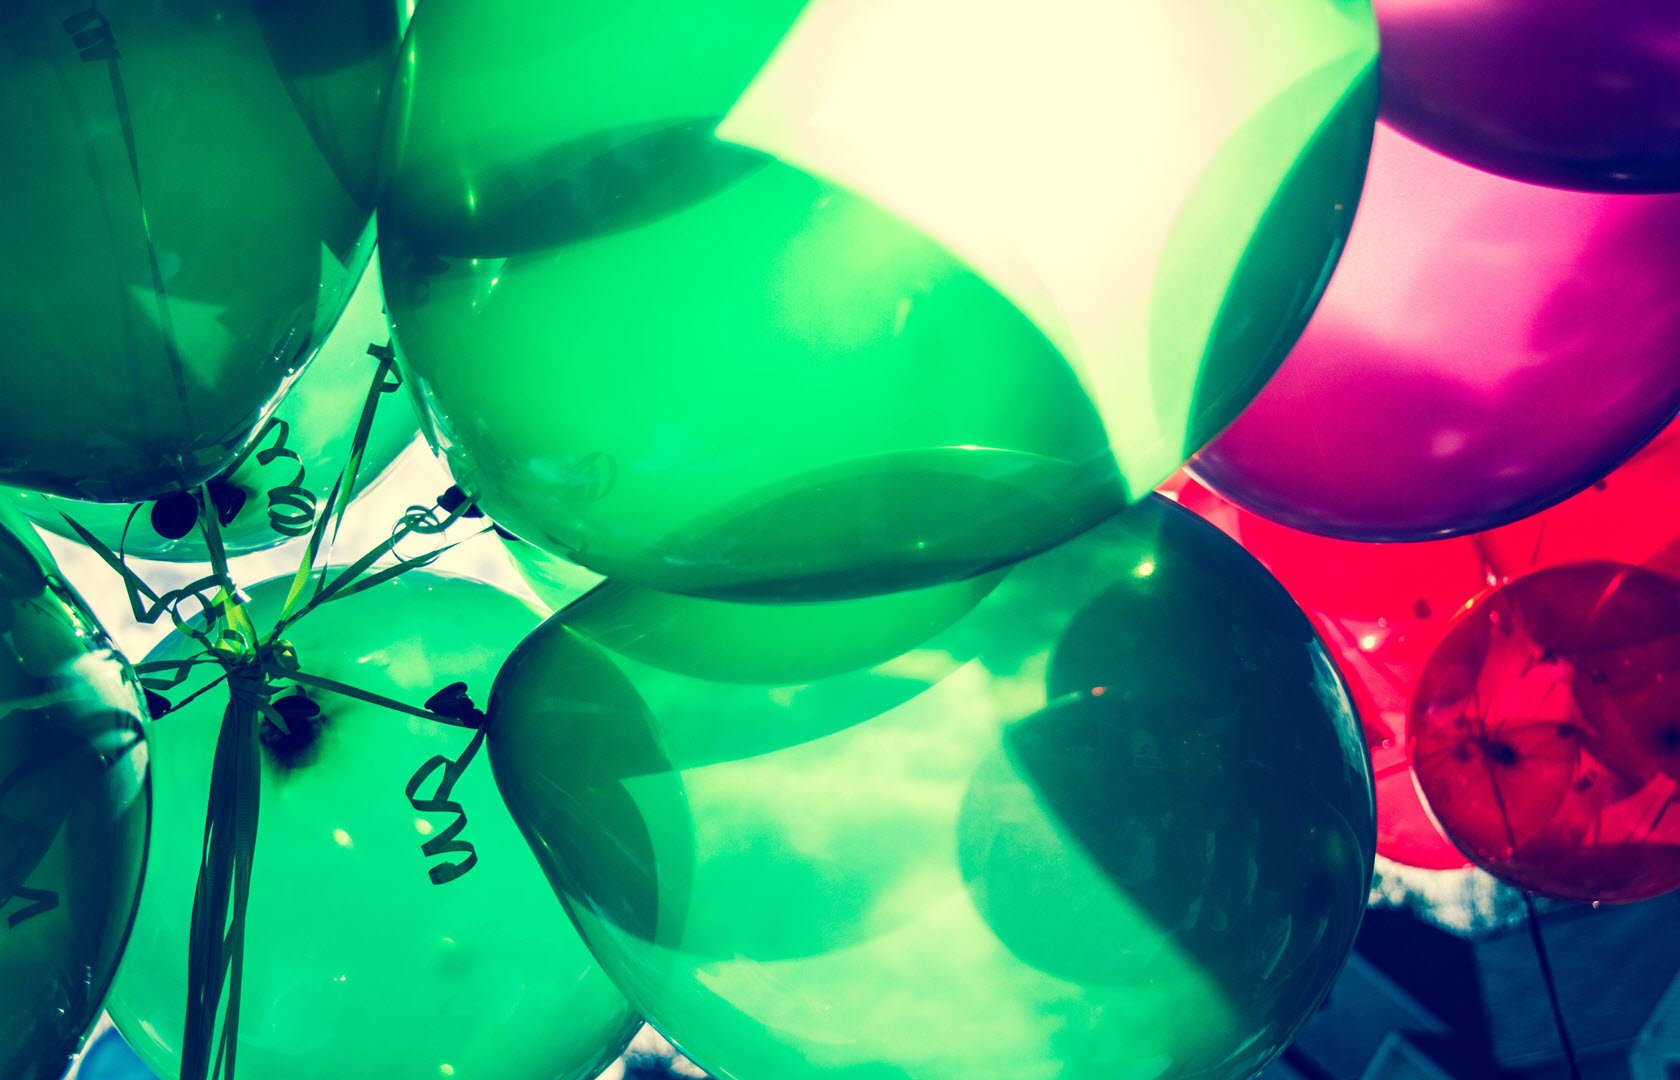 greenballoons.jpeg